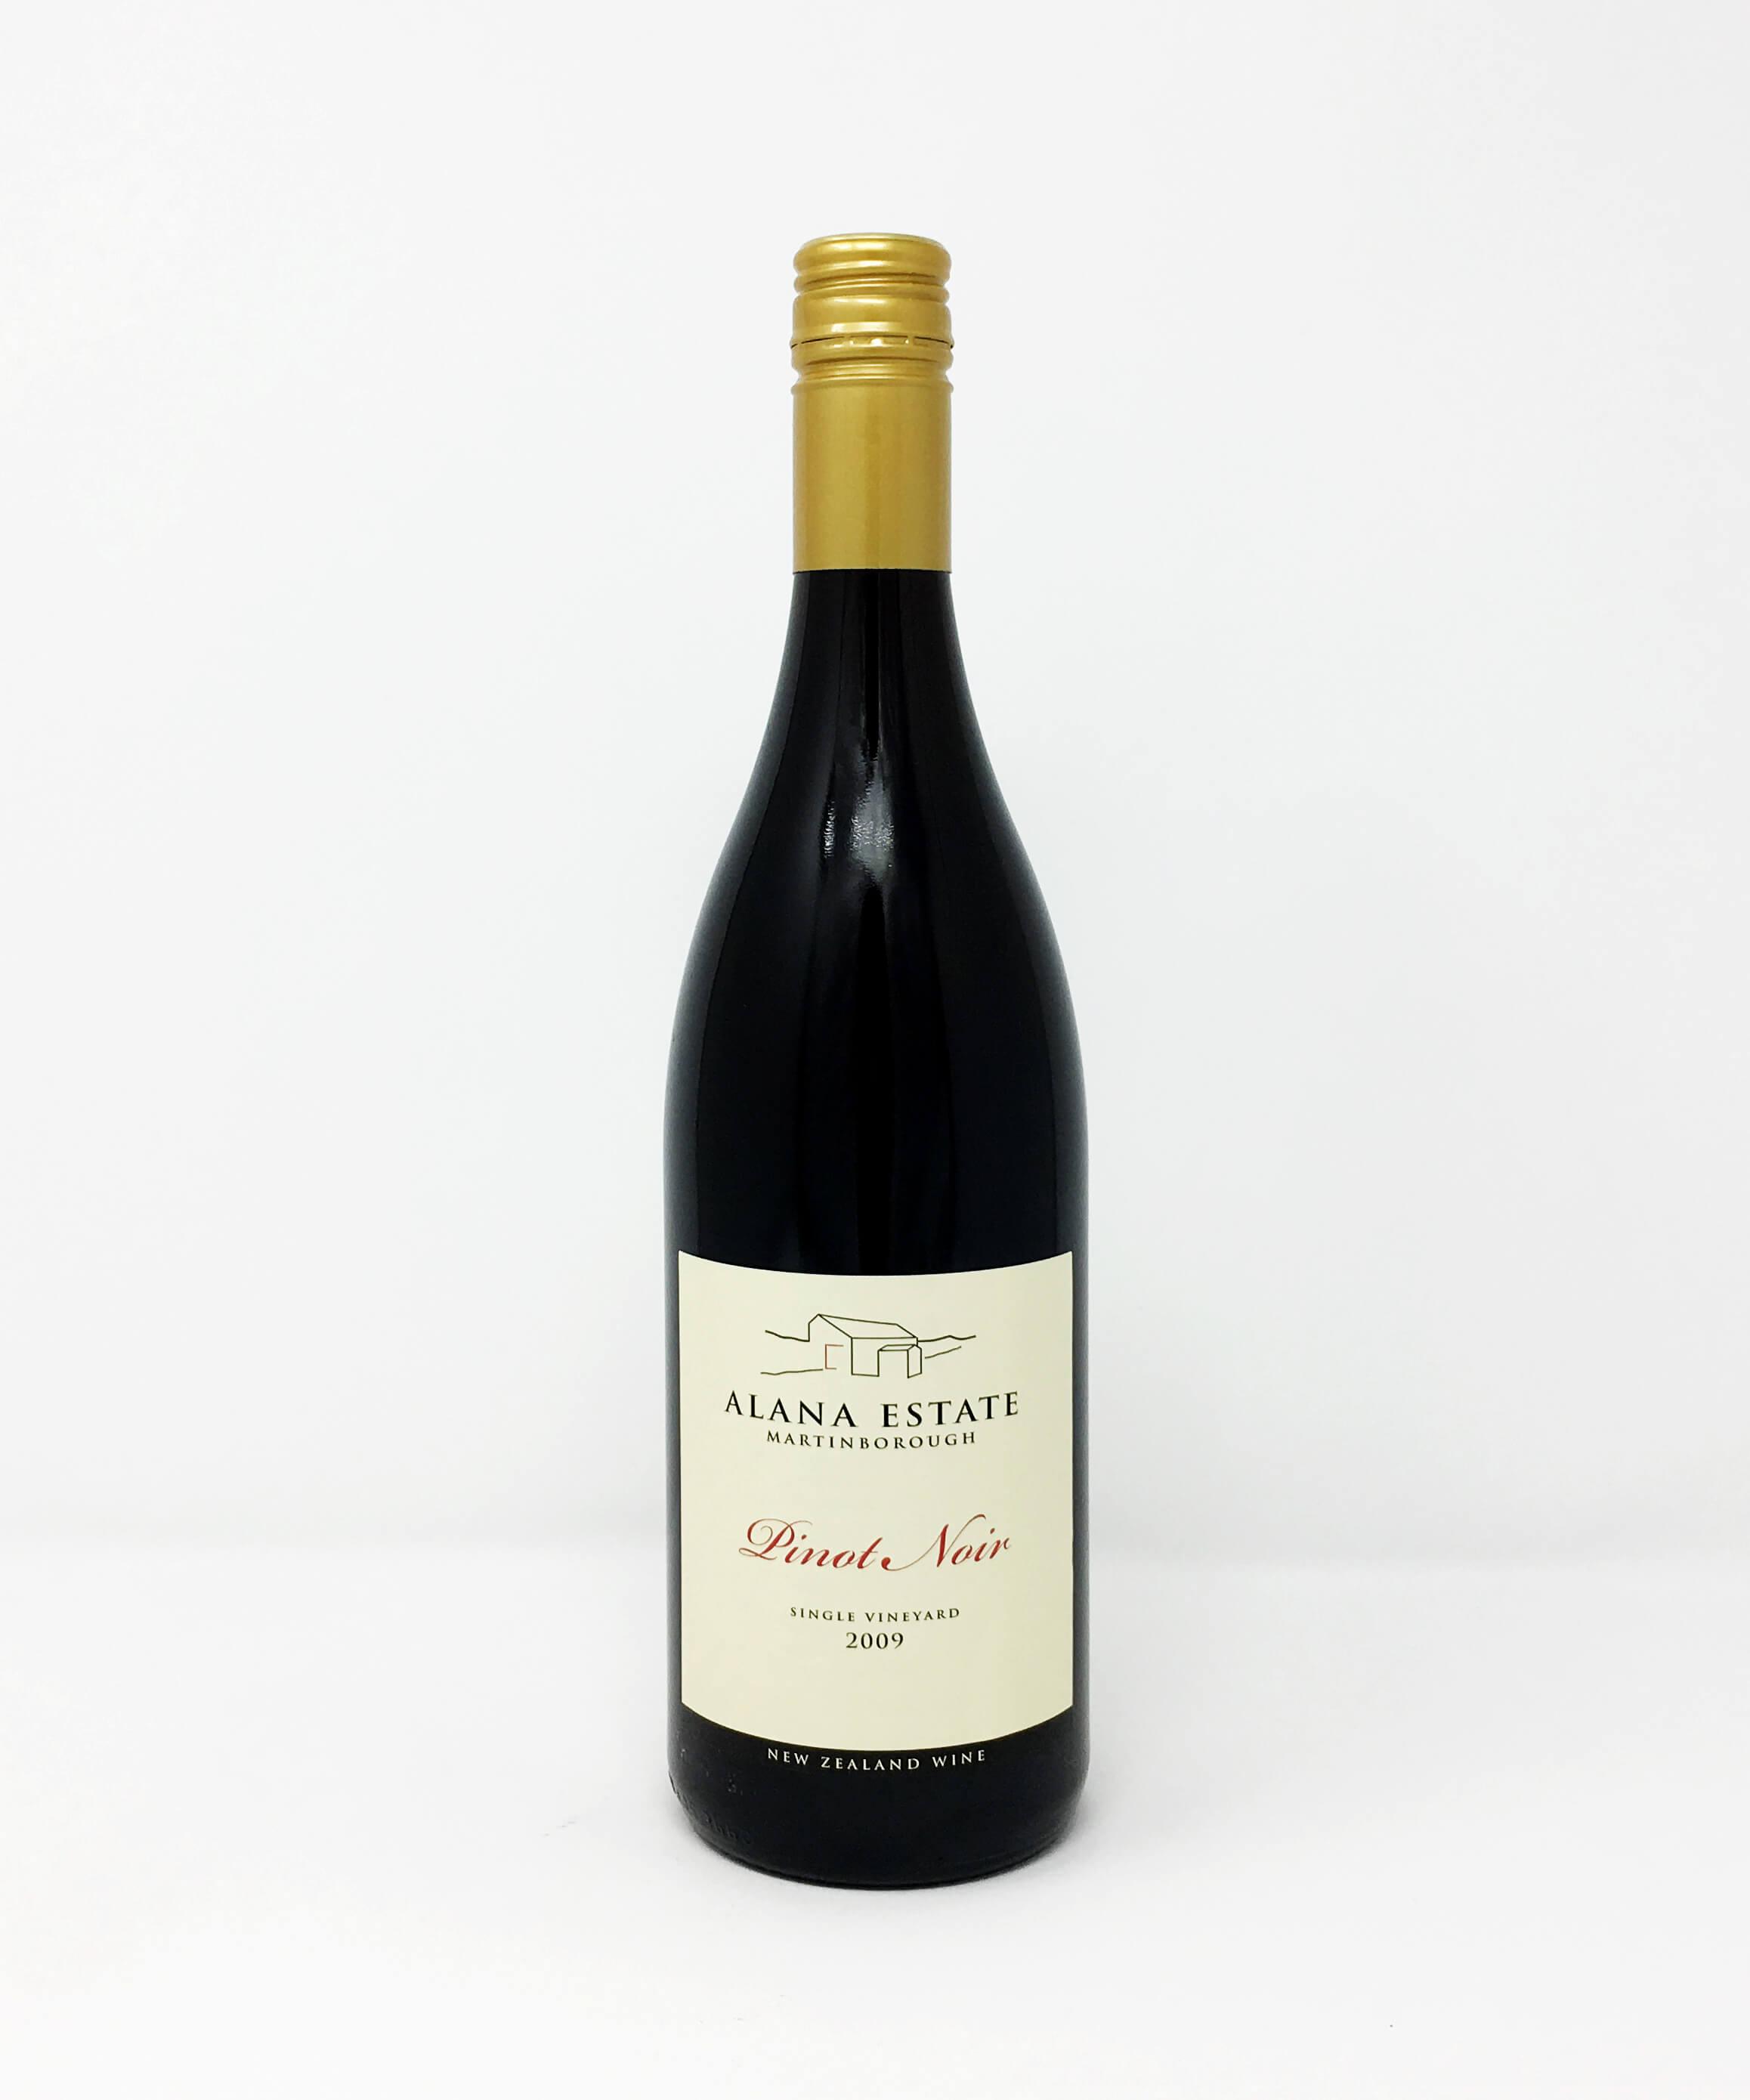 Alana Estate, Single Vineyard, Pinot Noir